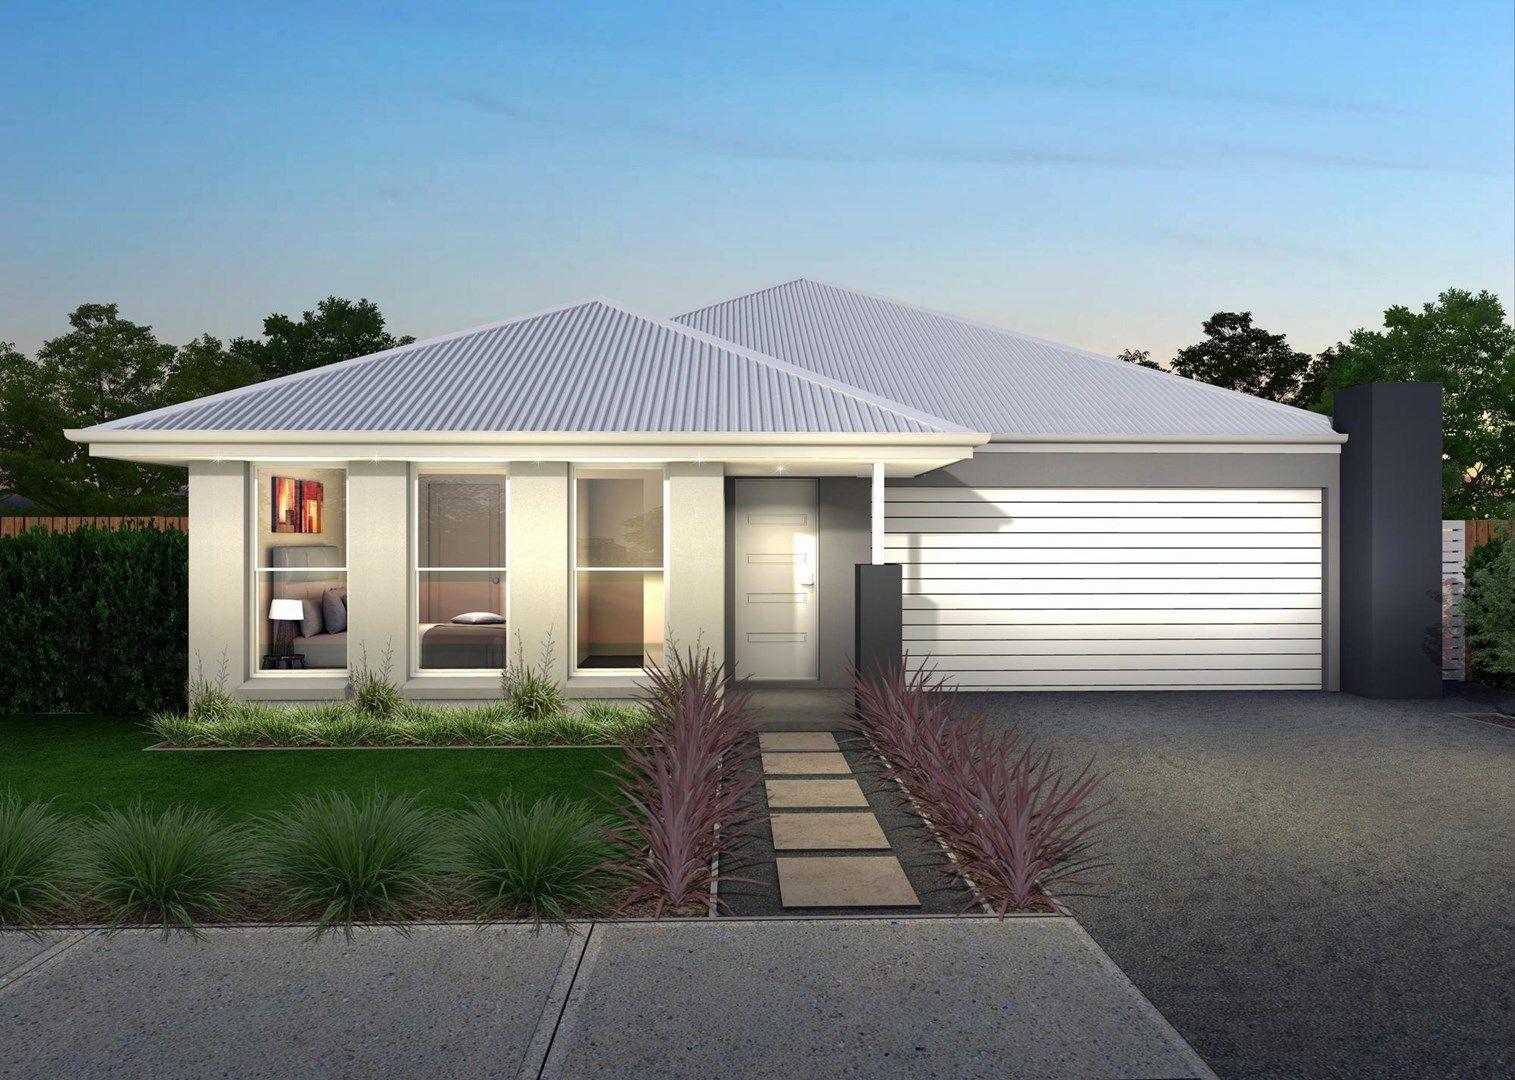 127 Proposed Road, Lochinvar NSW 2321, Image 0